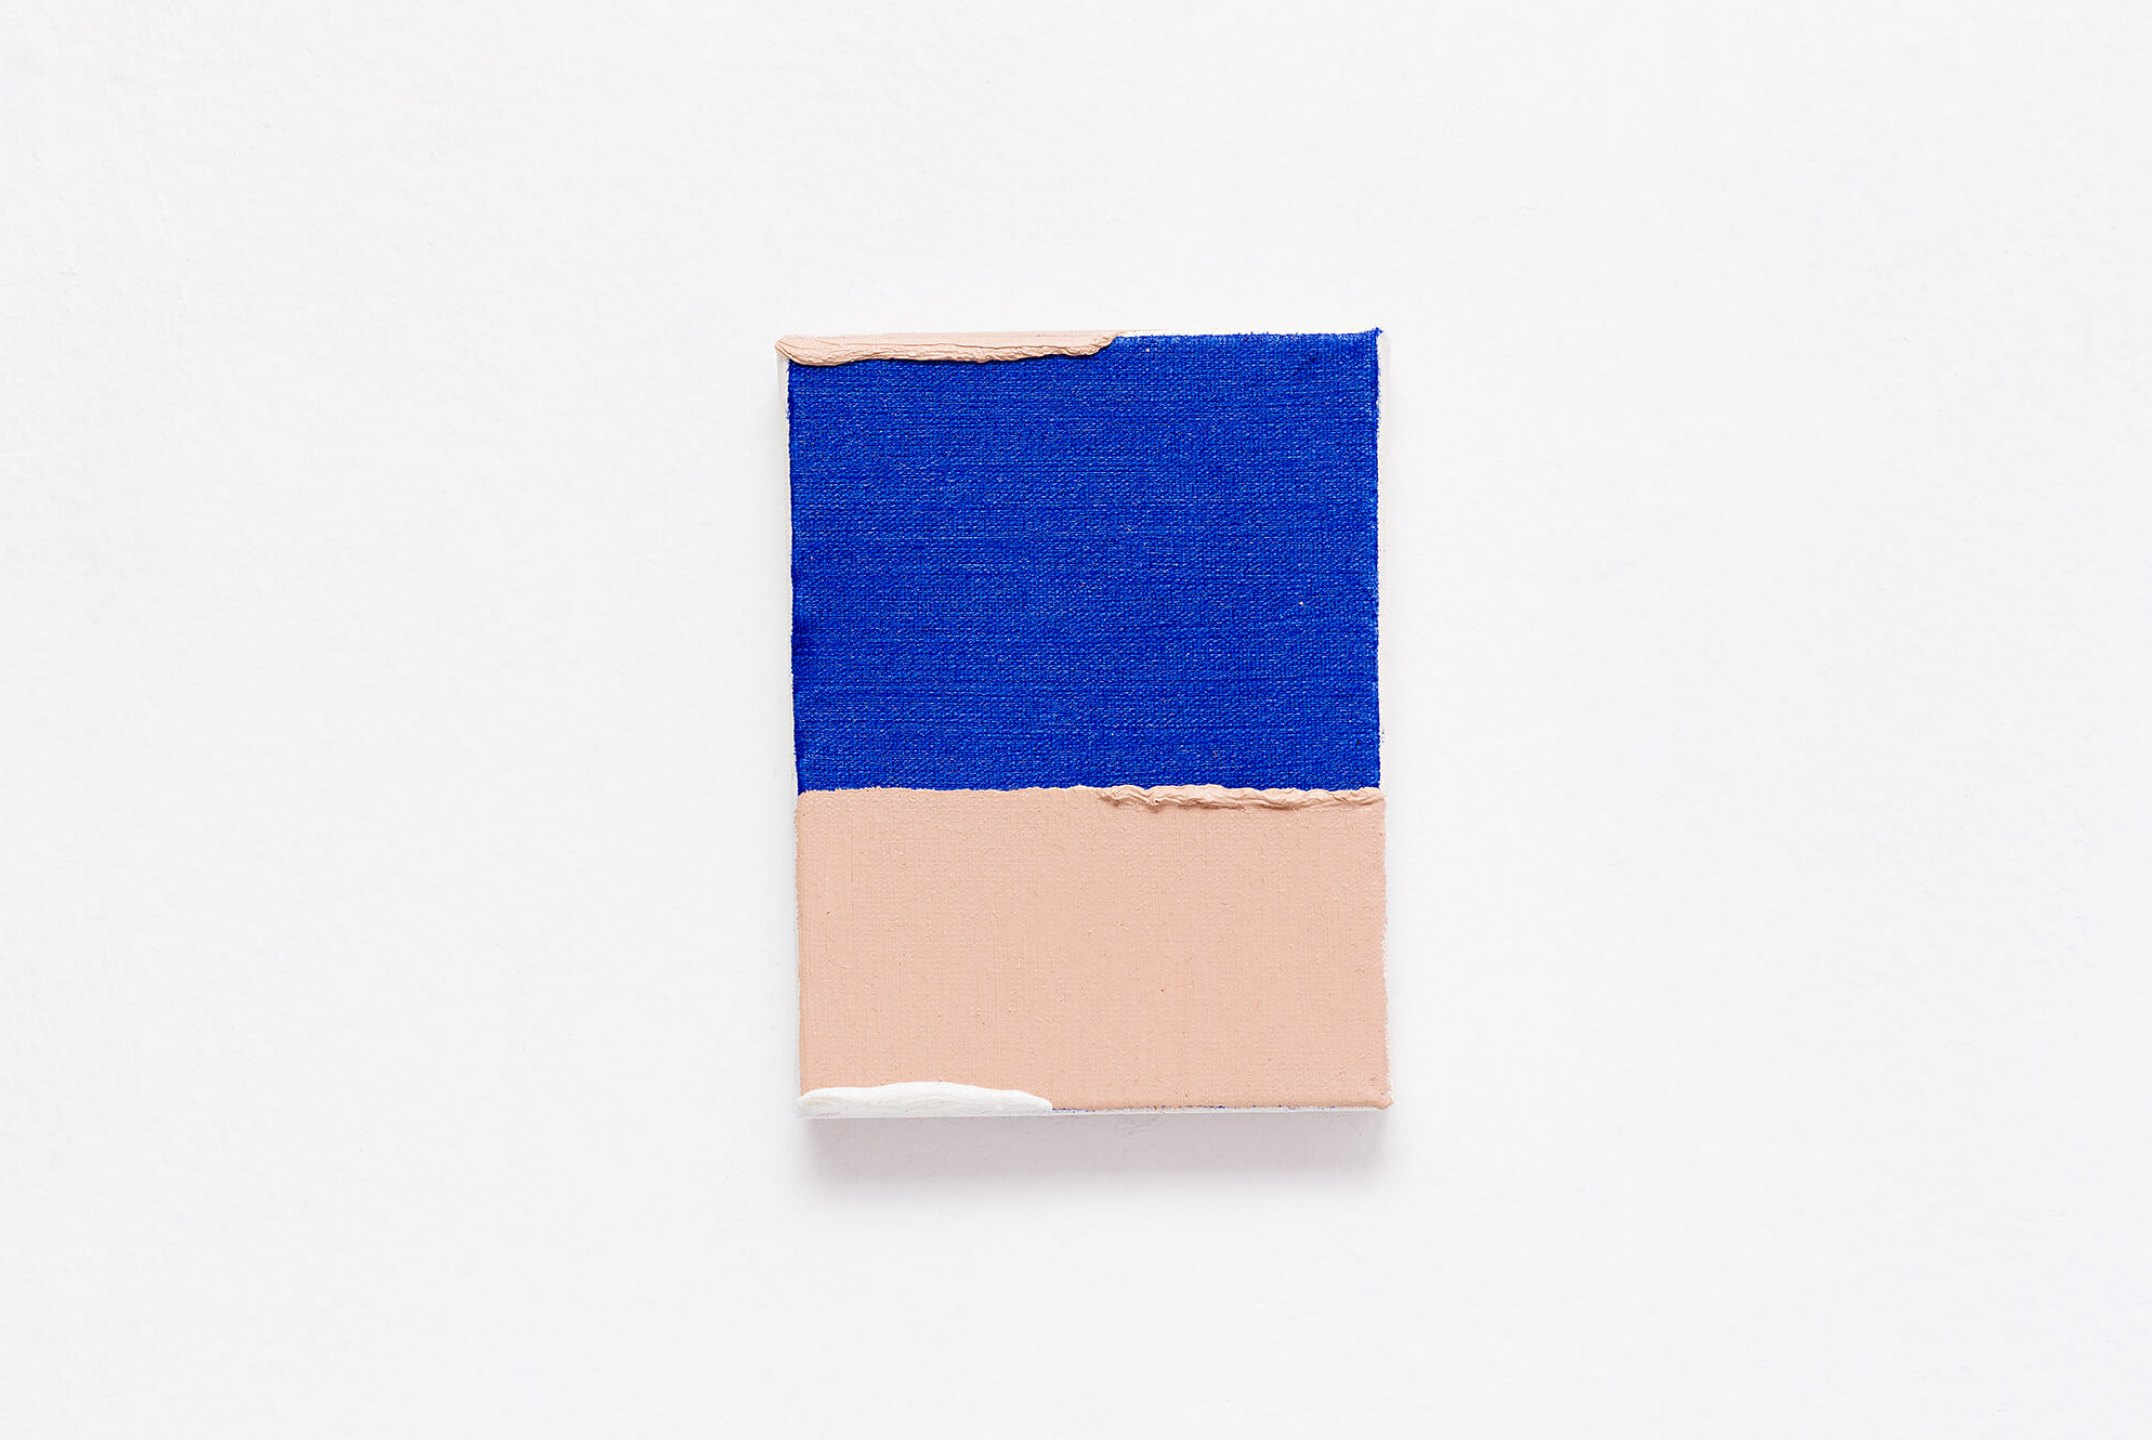 Paulo Monteiro,&nbsp;<em>Sea</em>, 2014, oil on canvas, 12 ×&nbsp;9 cm - Mendes Wood DM